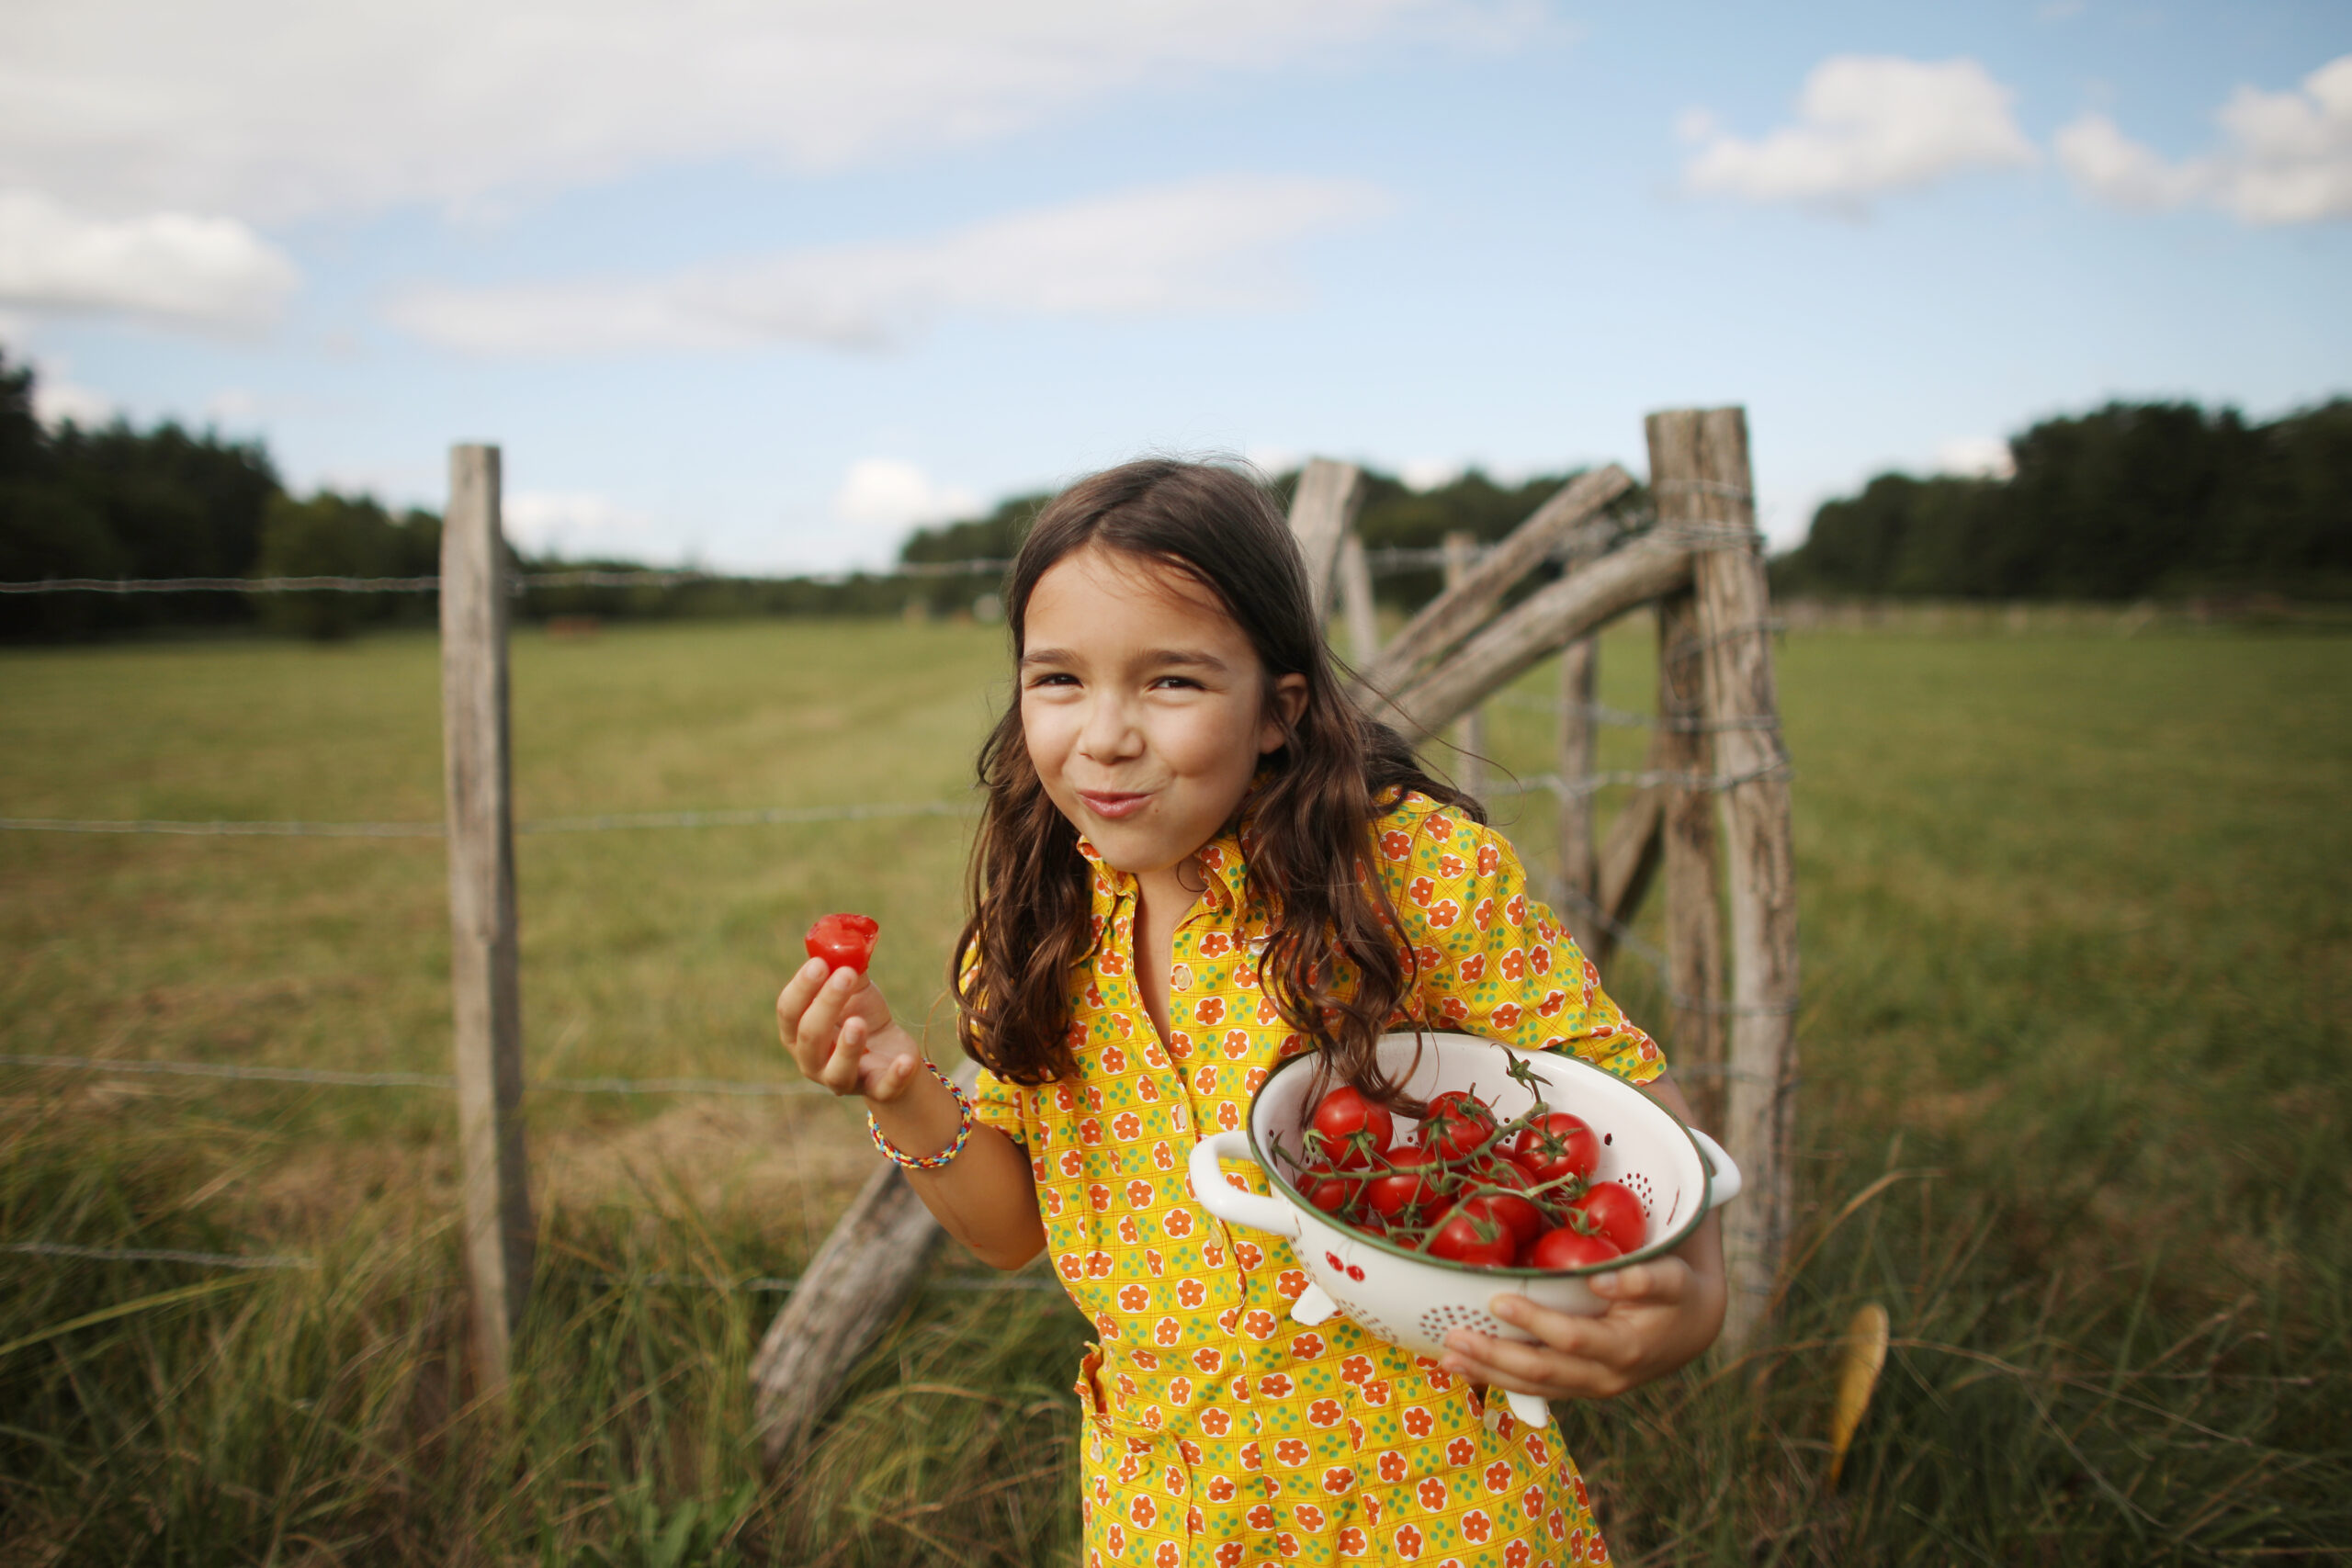 Tjej, tomater, landskap, gräs, staket, träd, natur, ekologisk, röd, himmel, moln, blå, mat